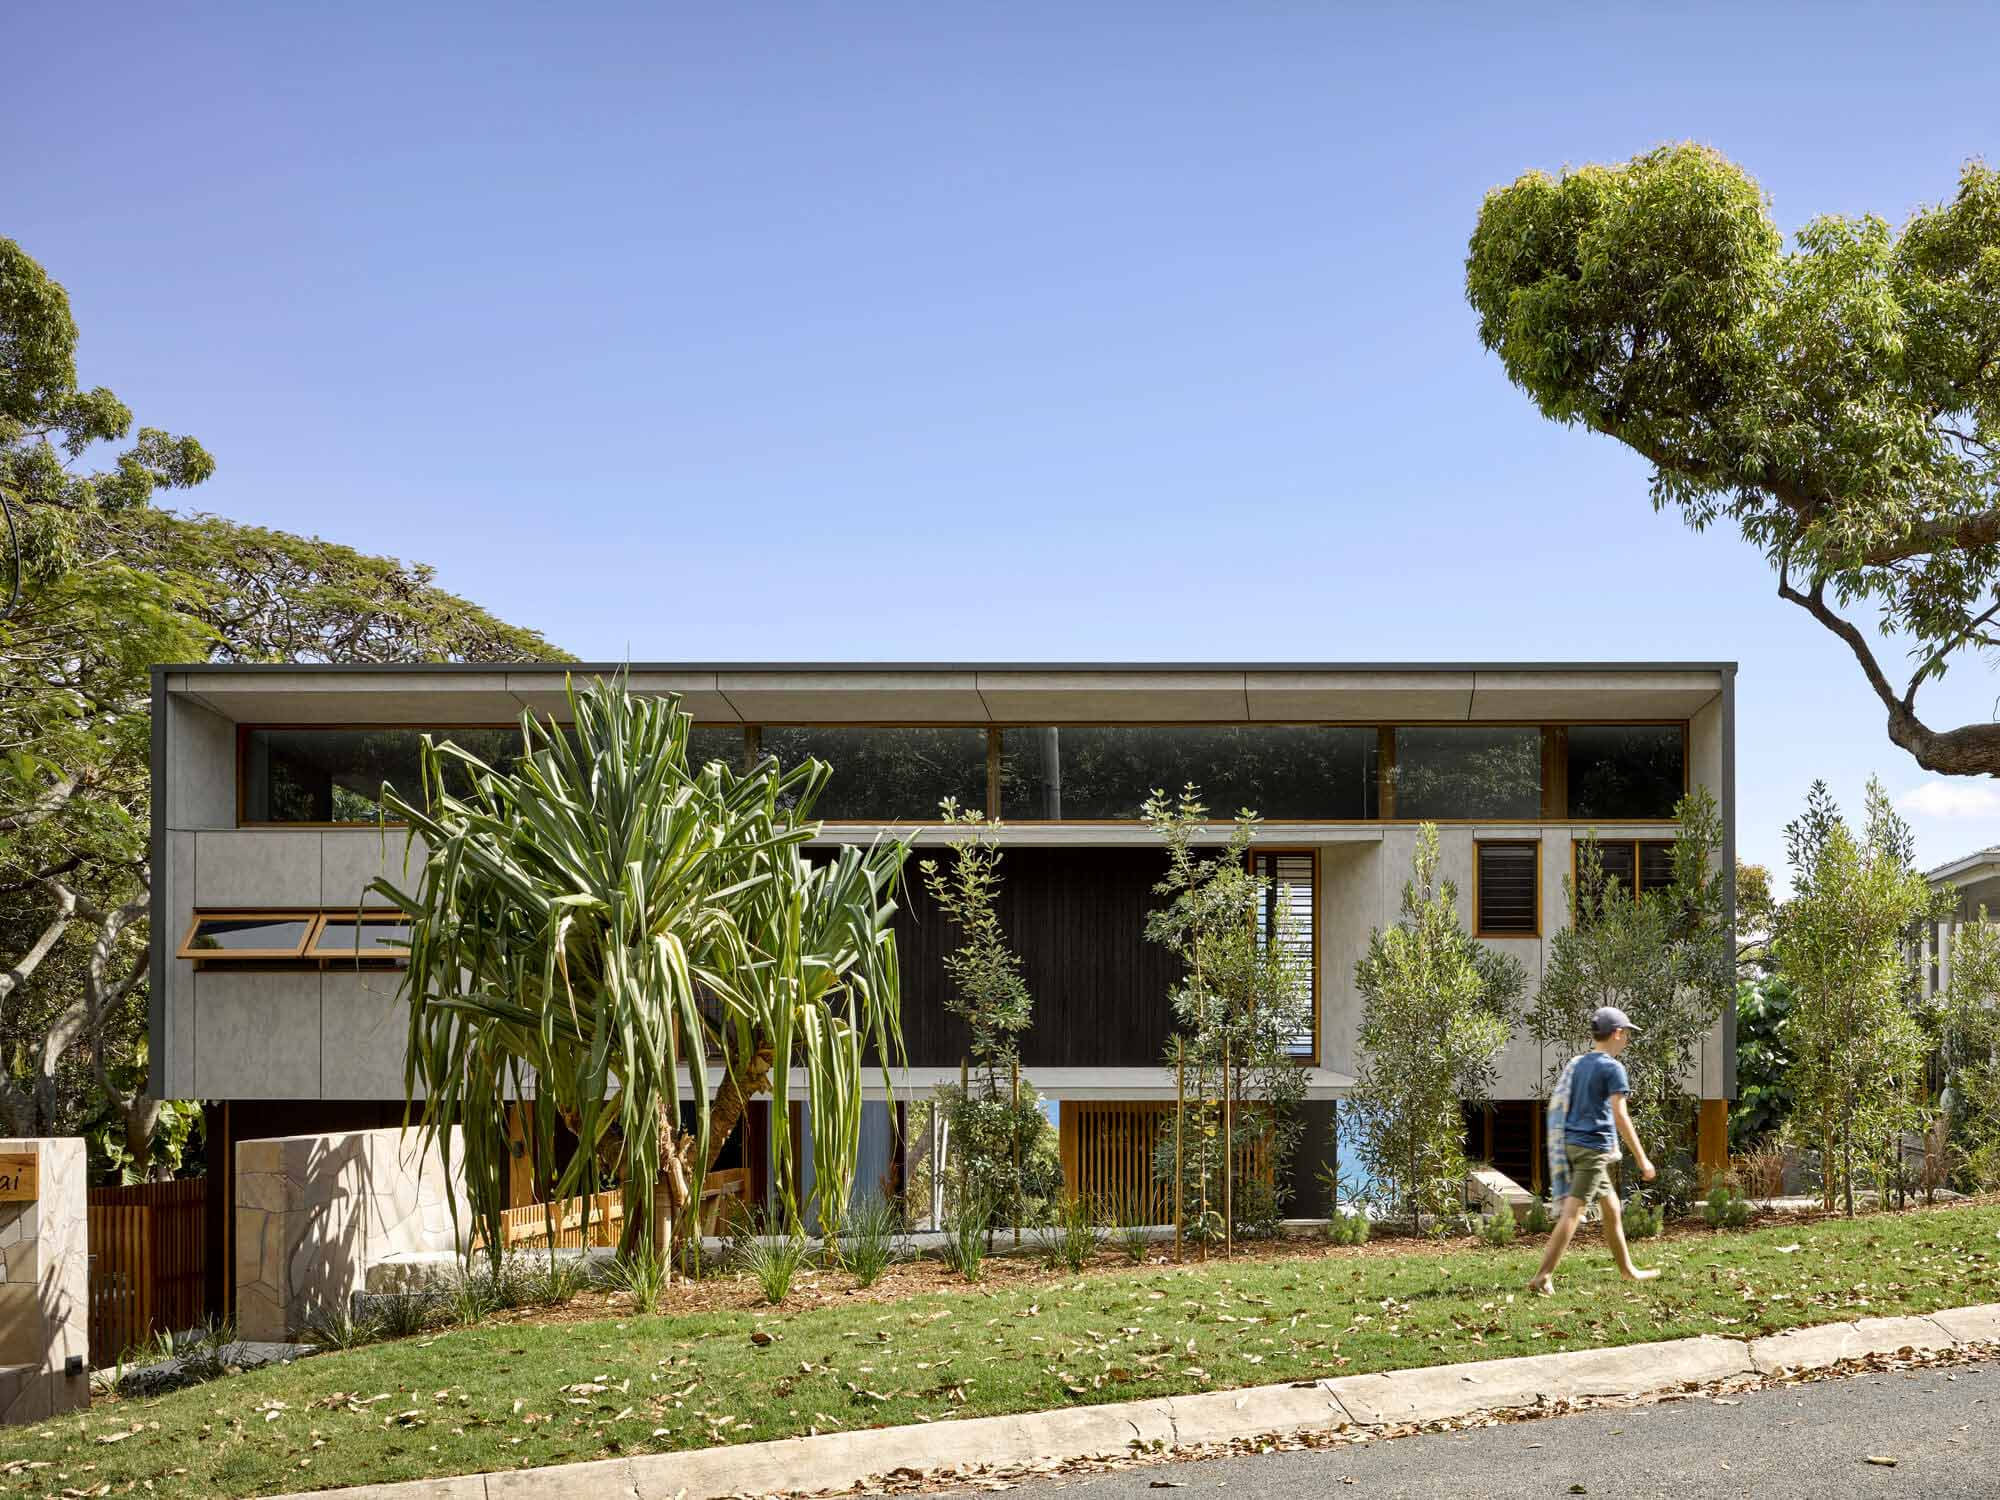 Nannygai House / Архитектор Пола Баттерворта